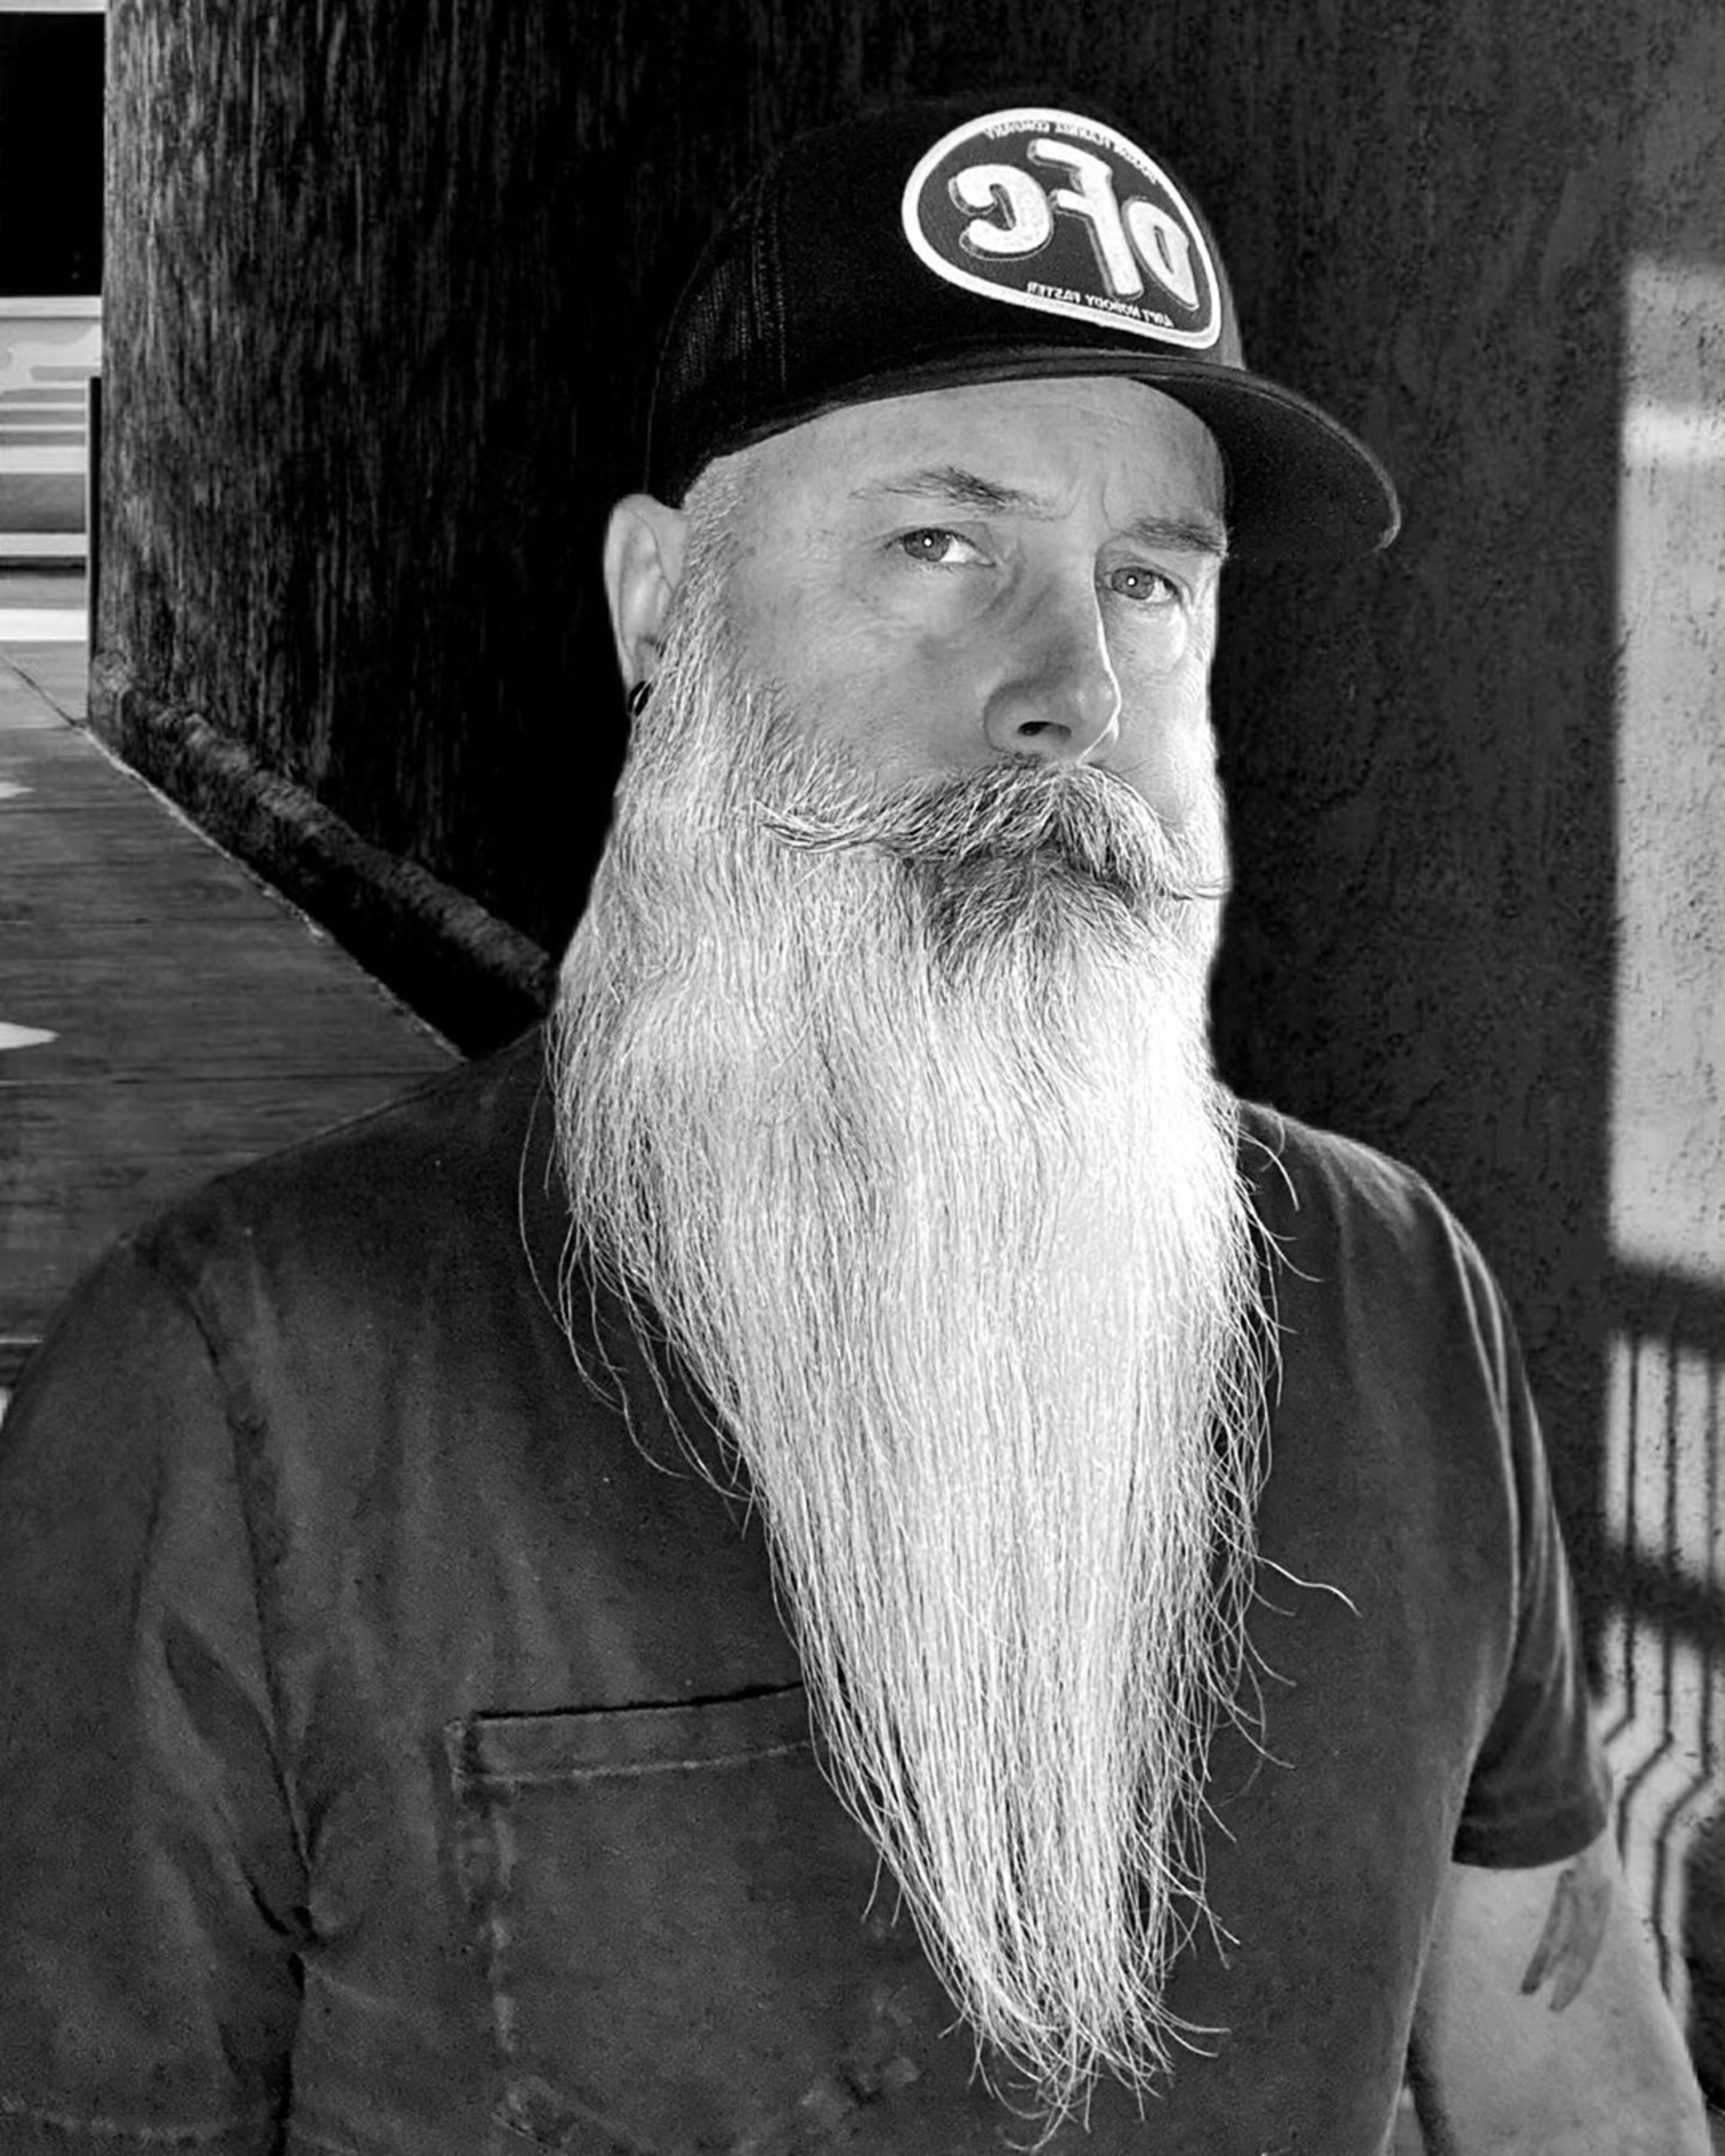 A long beard of the narrow size.